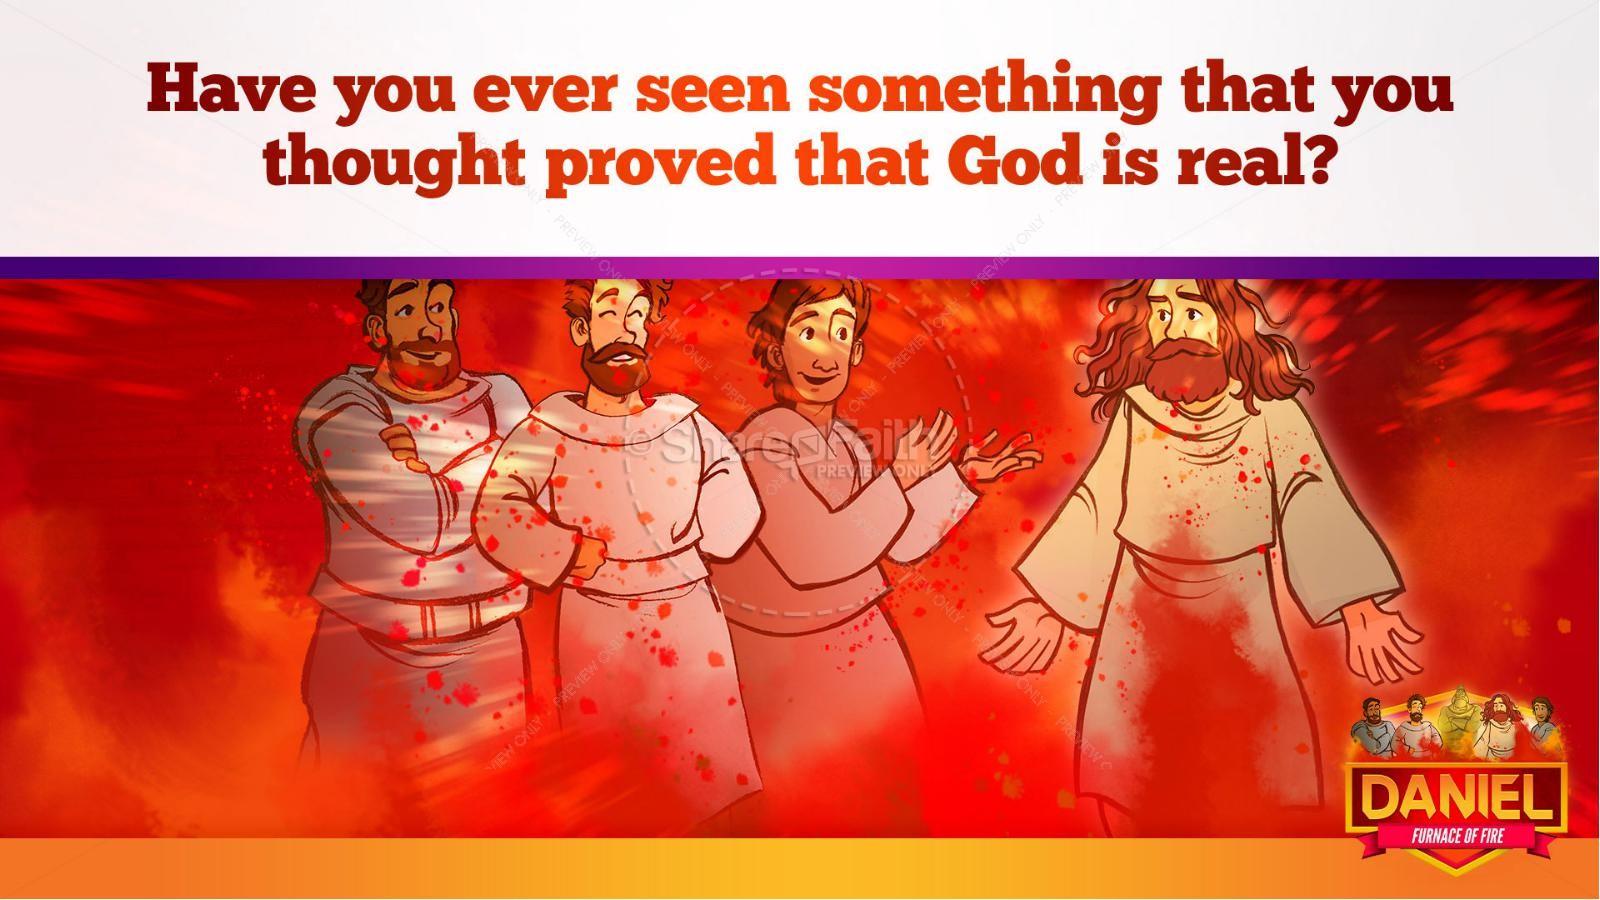 Daniel 3 The Furnace of Fire Kids Bible Story | slide 33